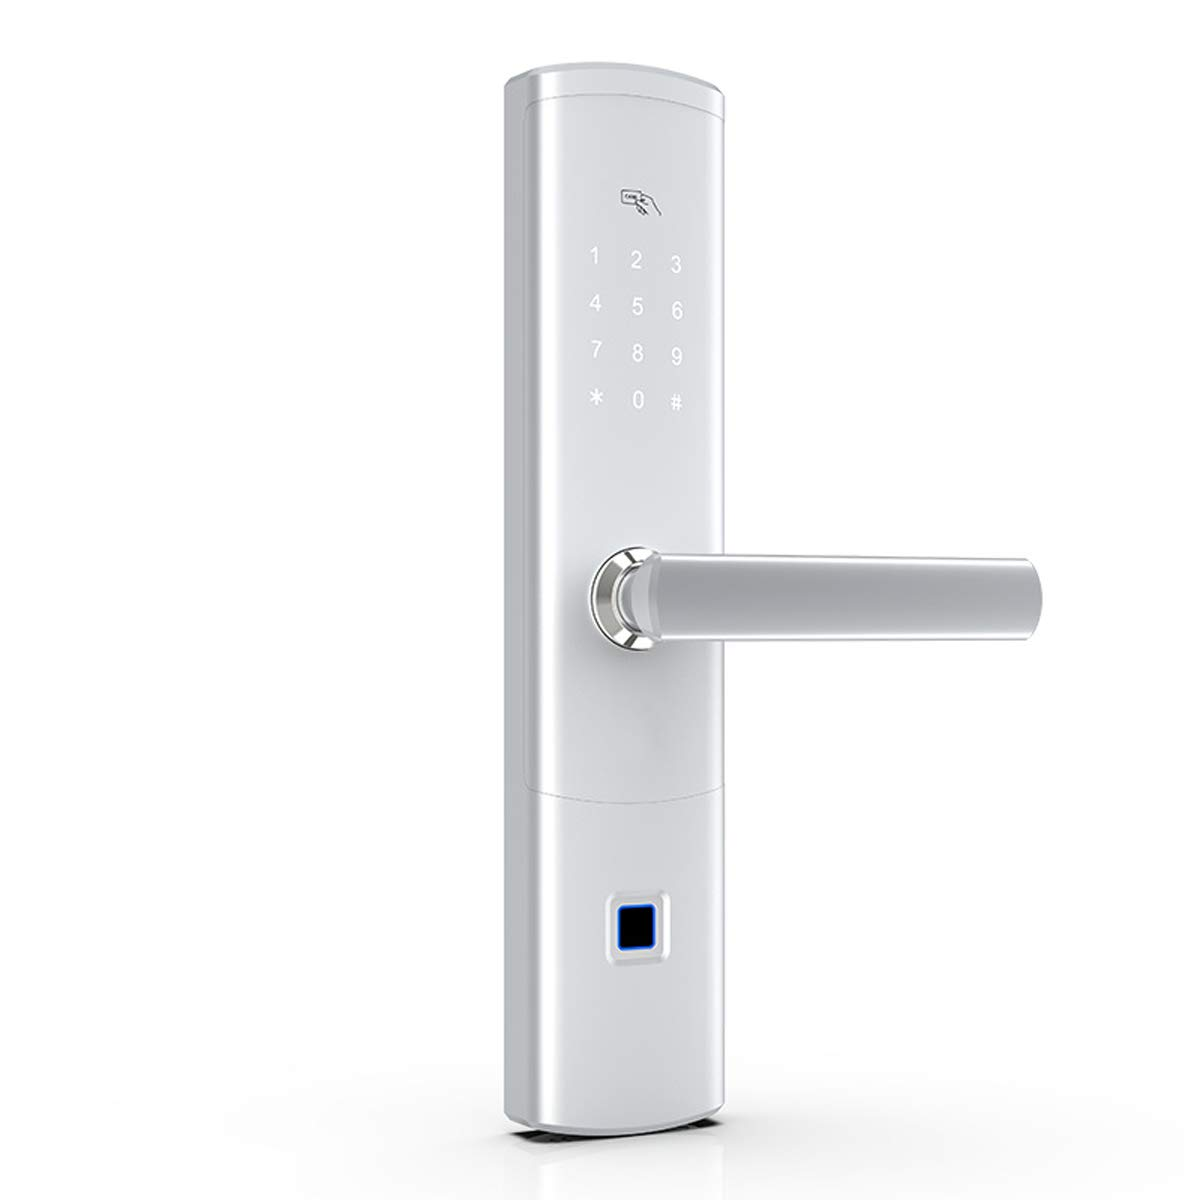 Love of Life Fingerprint Smart Door Lock keyless Entry Lock APP Remote one-Button Unlock, Voice Prompt,FPC high Precision Fingerprint Reader,Silver